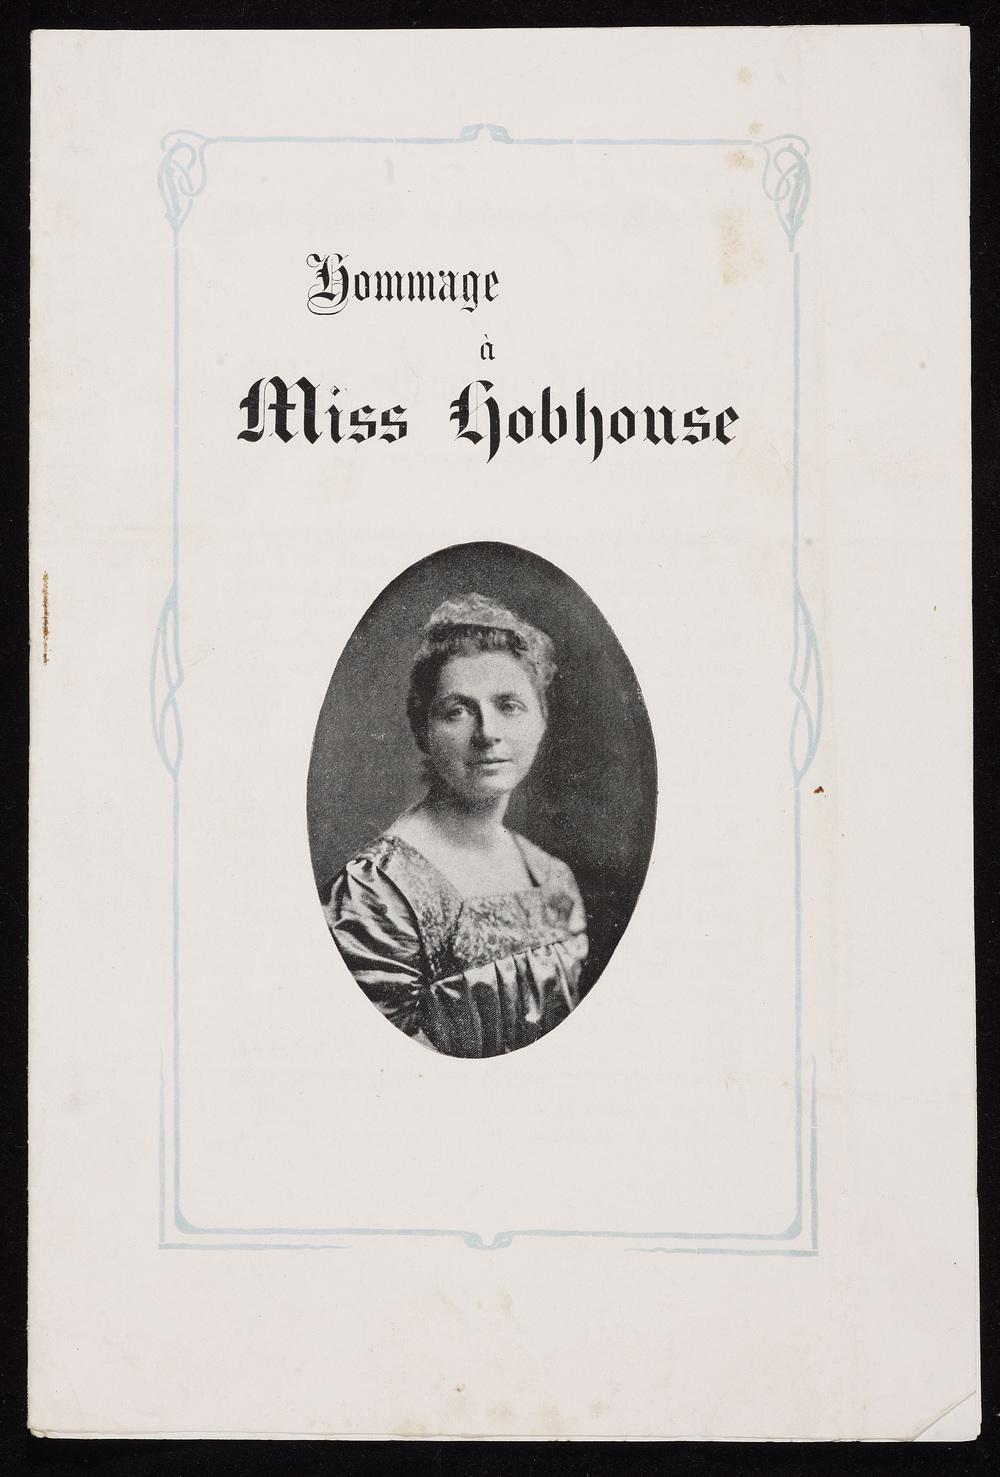 Pamphlet, Hommage à Miss Hobhouse